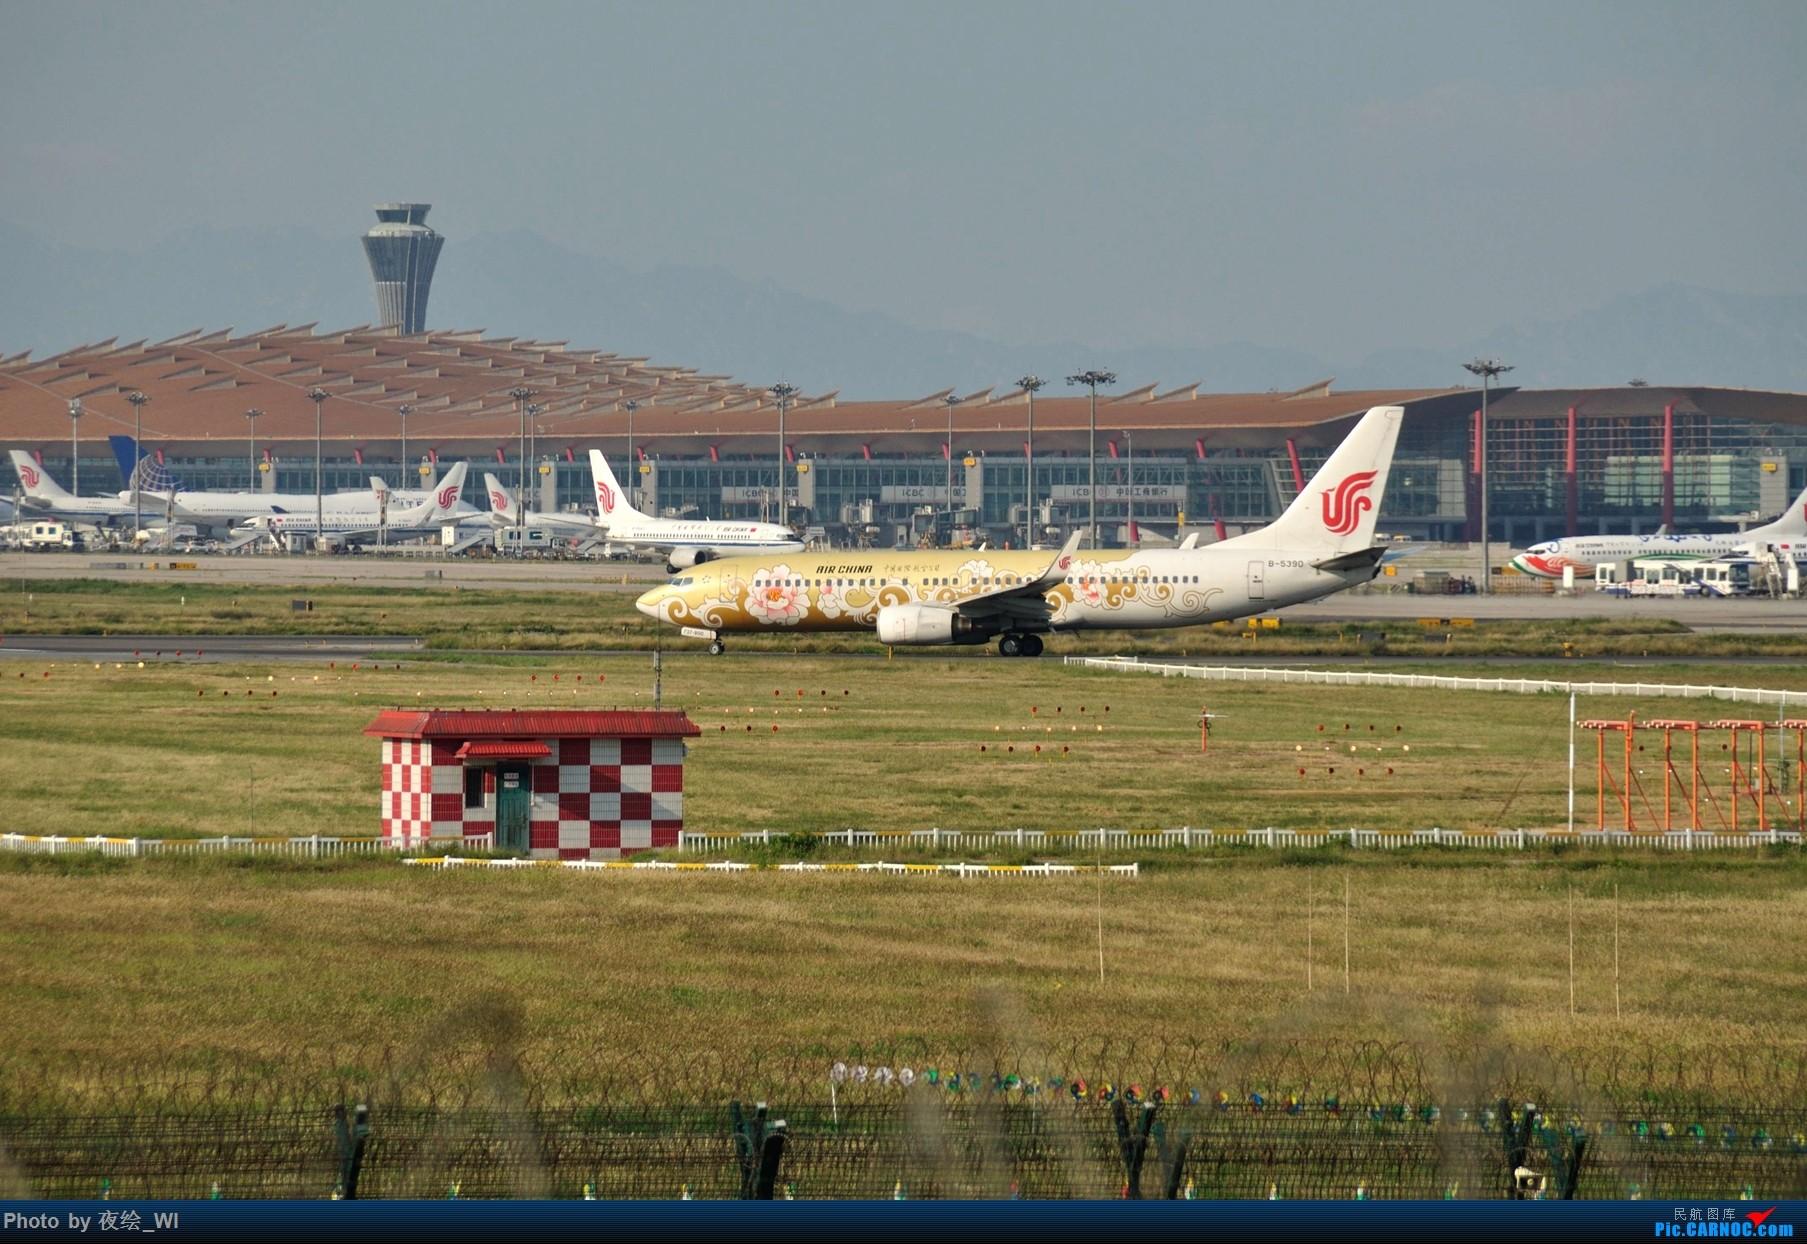 Re:[原创]【PEK】初刷八卦台,拍得飞起! BOEING 737-800 B-5390 中国北京首都国际机场